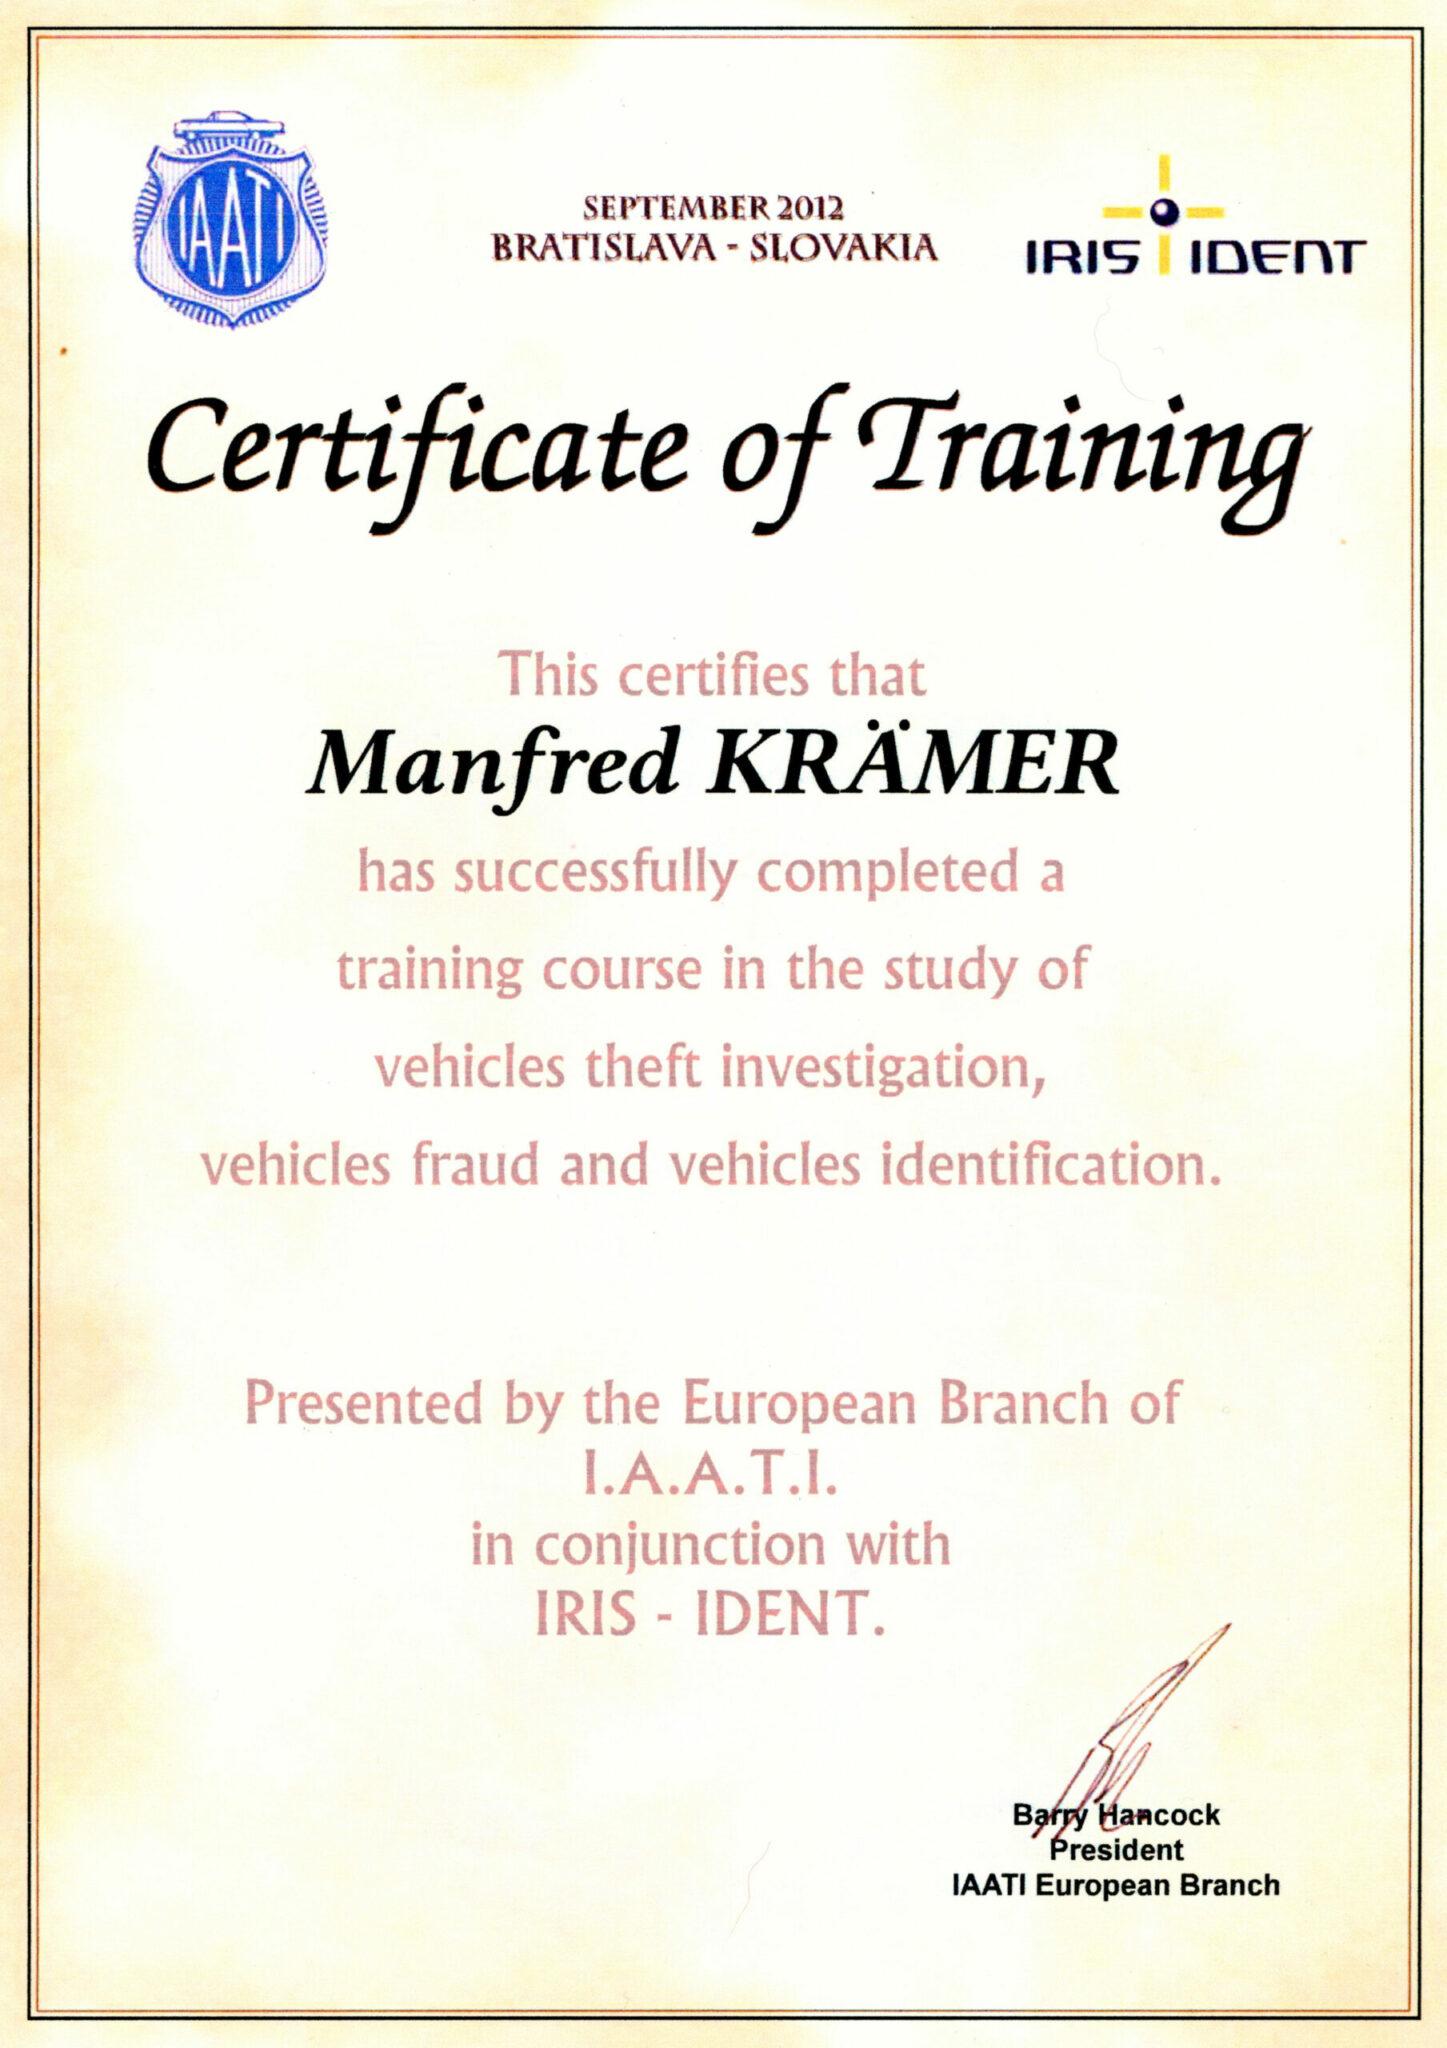 Iaati Certificat 2012